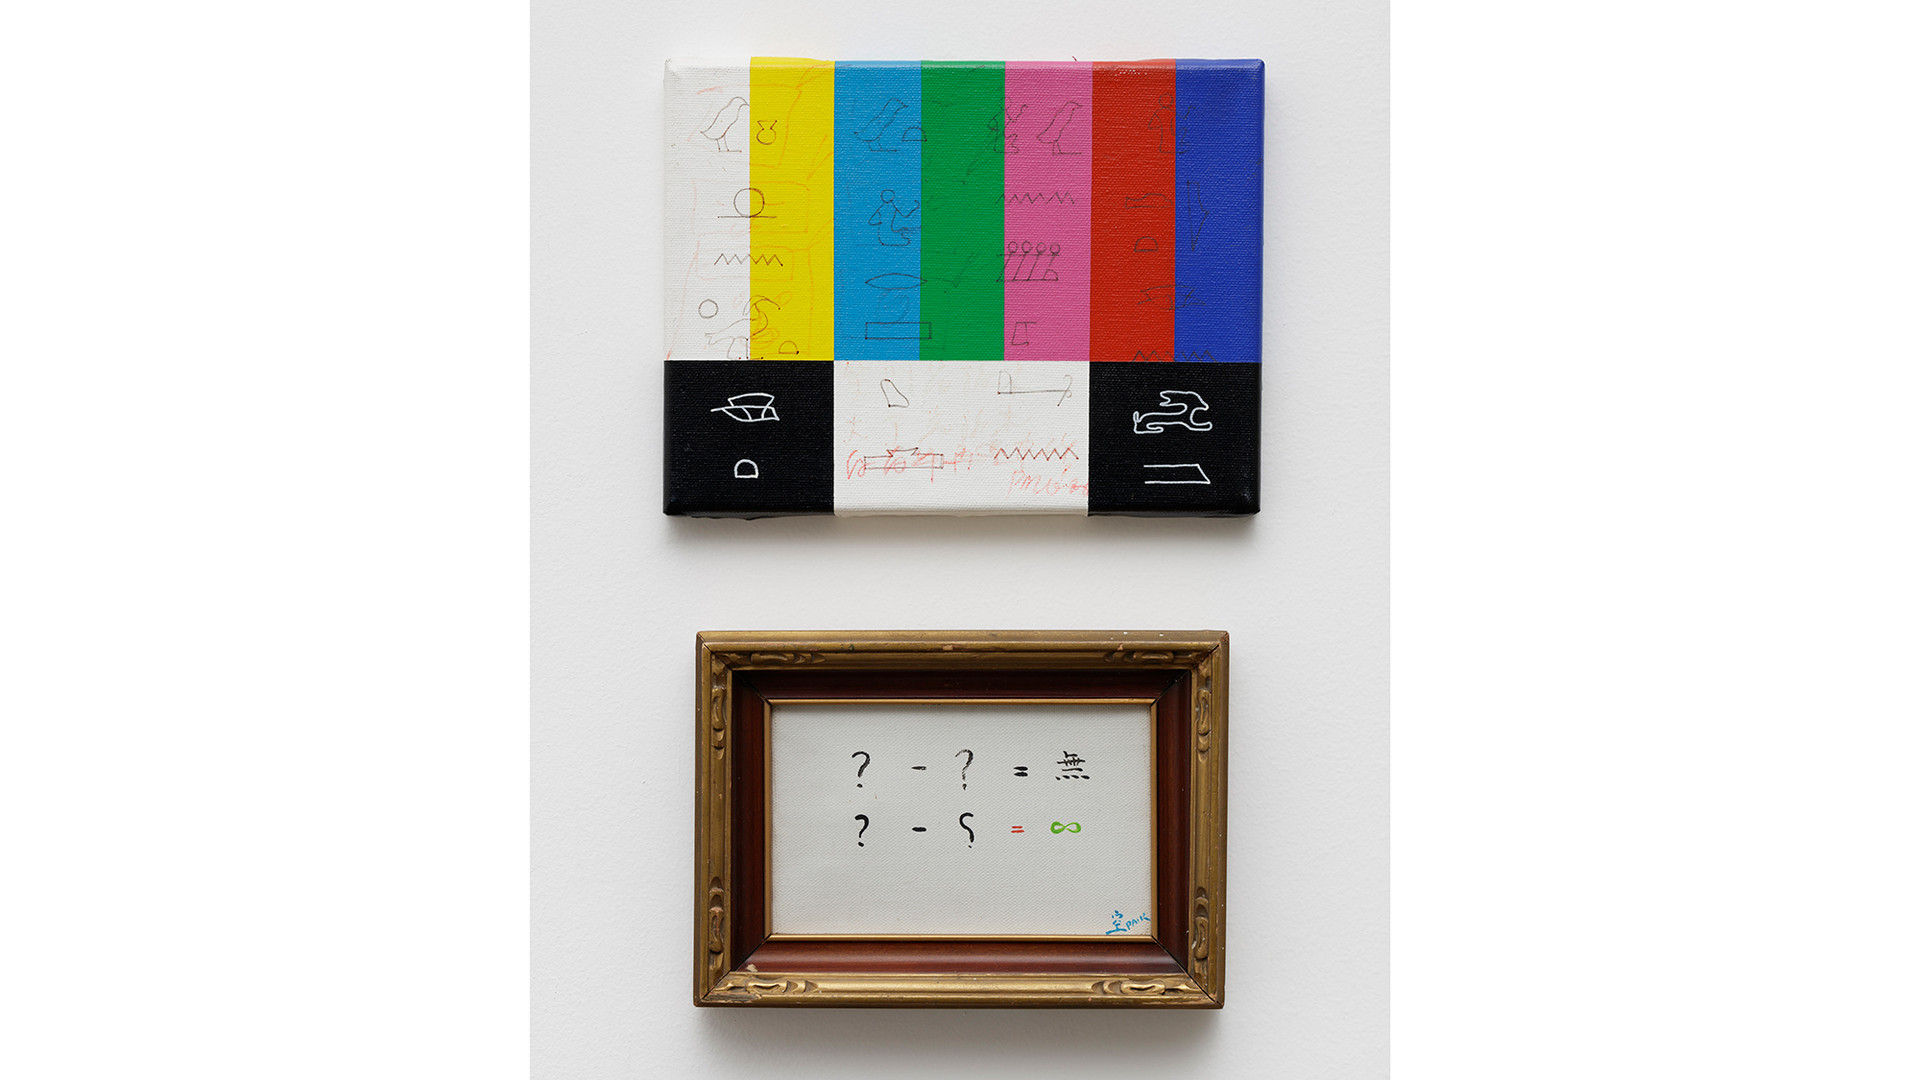 Nam June Paik, Untitled, 1998, acrylic on canvas, 18.4x24cm, Untitled, acrylic on canvas, 15x21cm